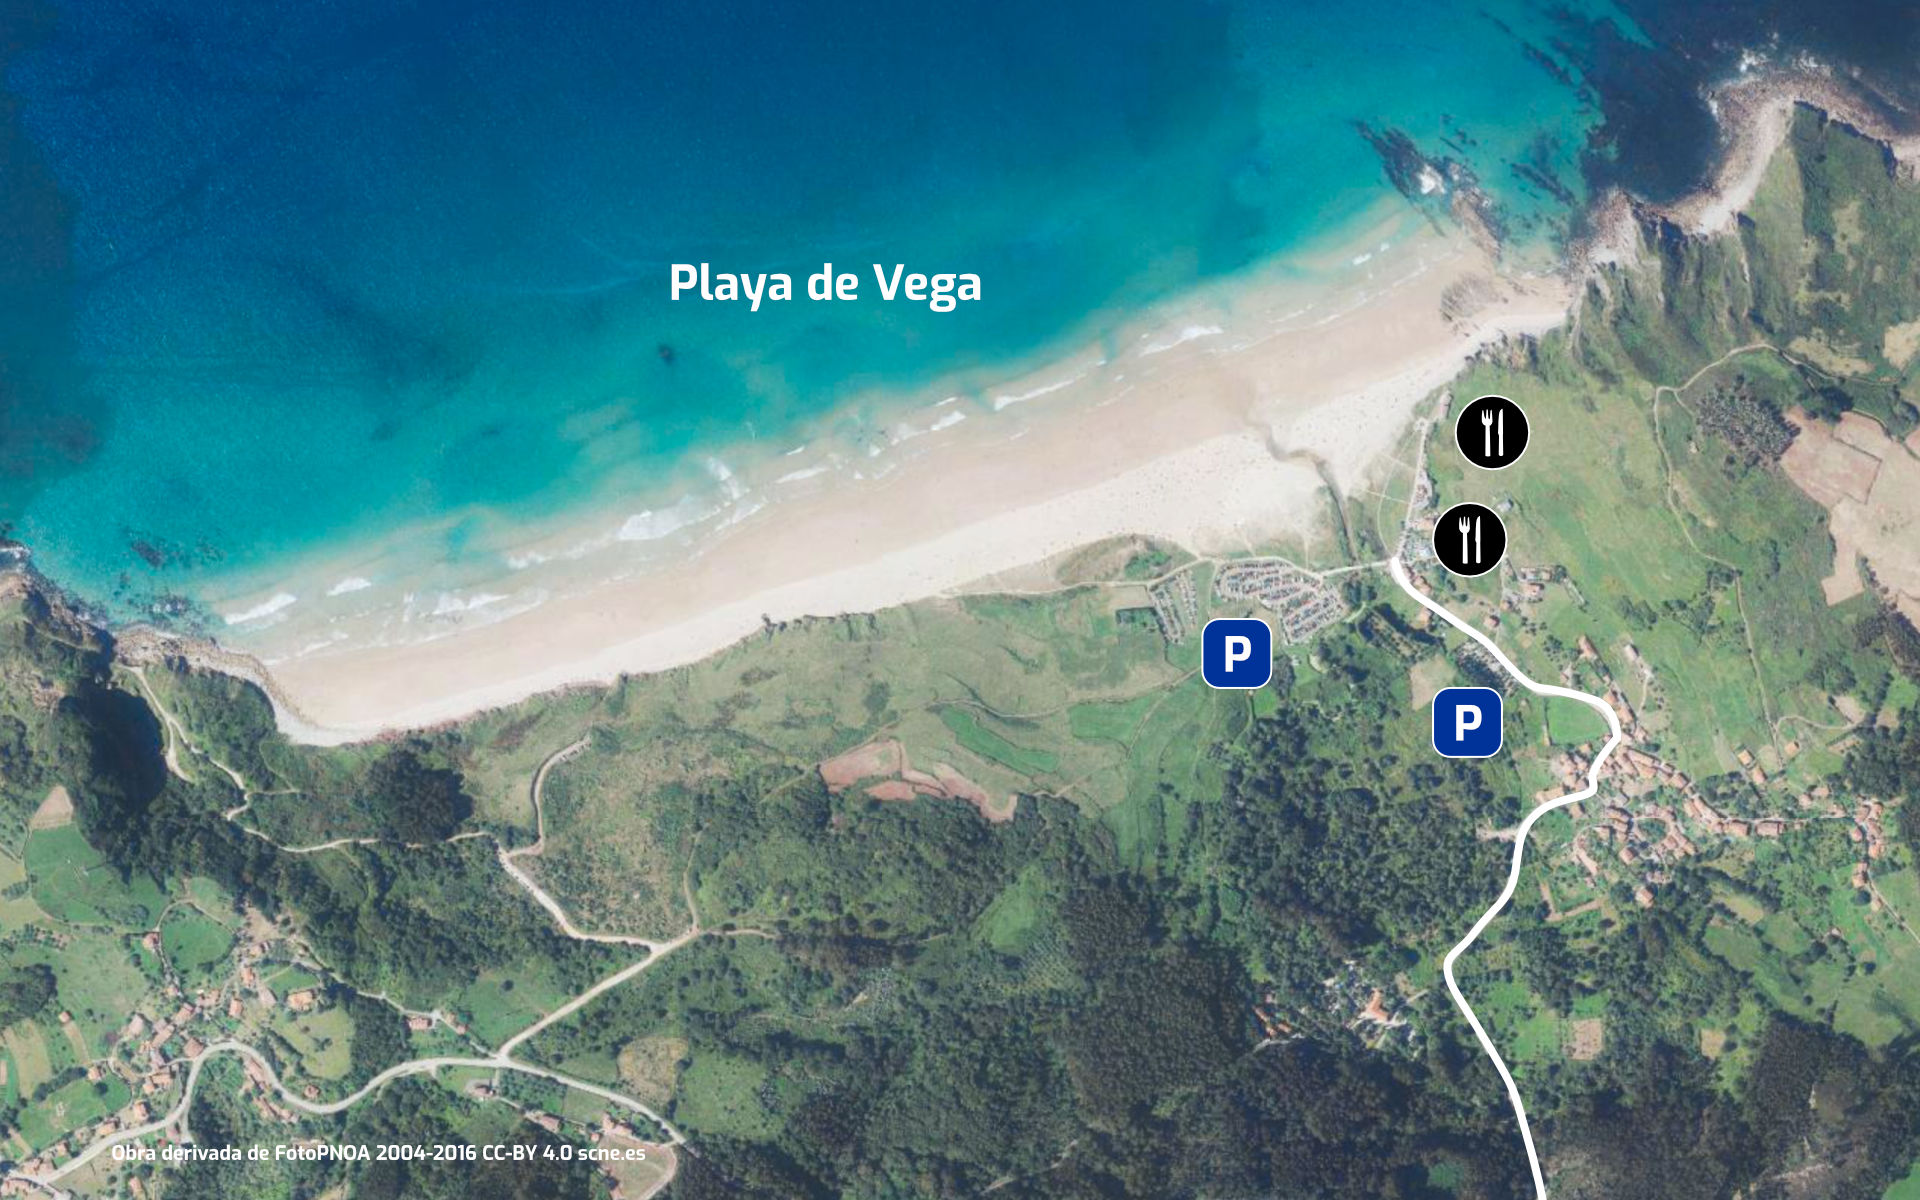 Mapa de la Playa de Vega en Ribadesella, Asturias